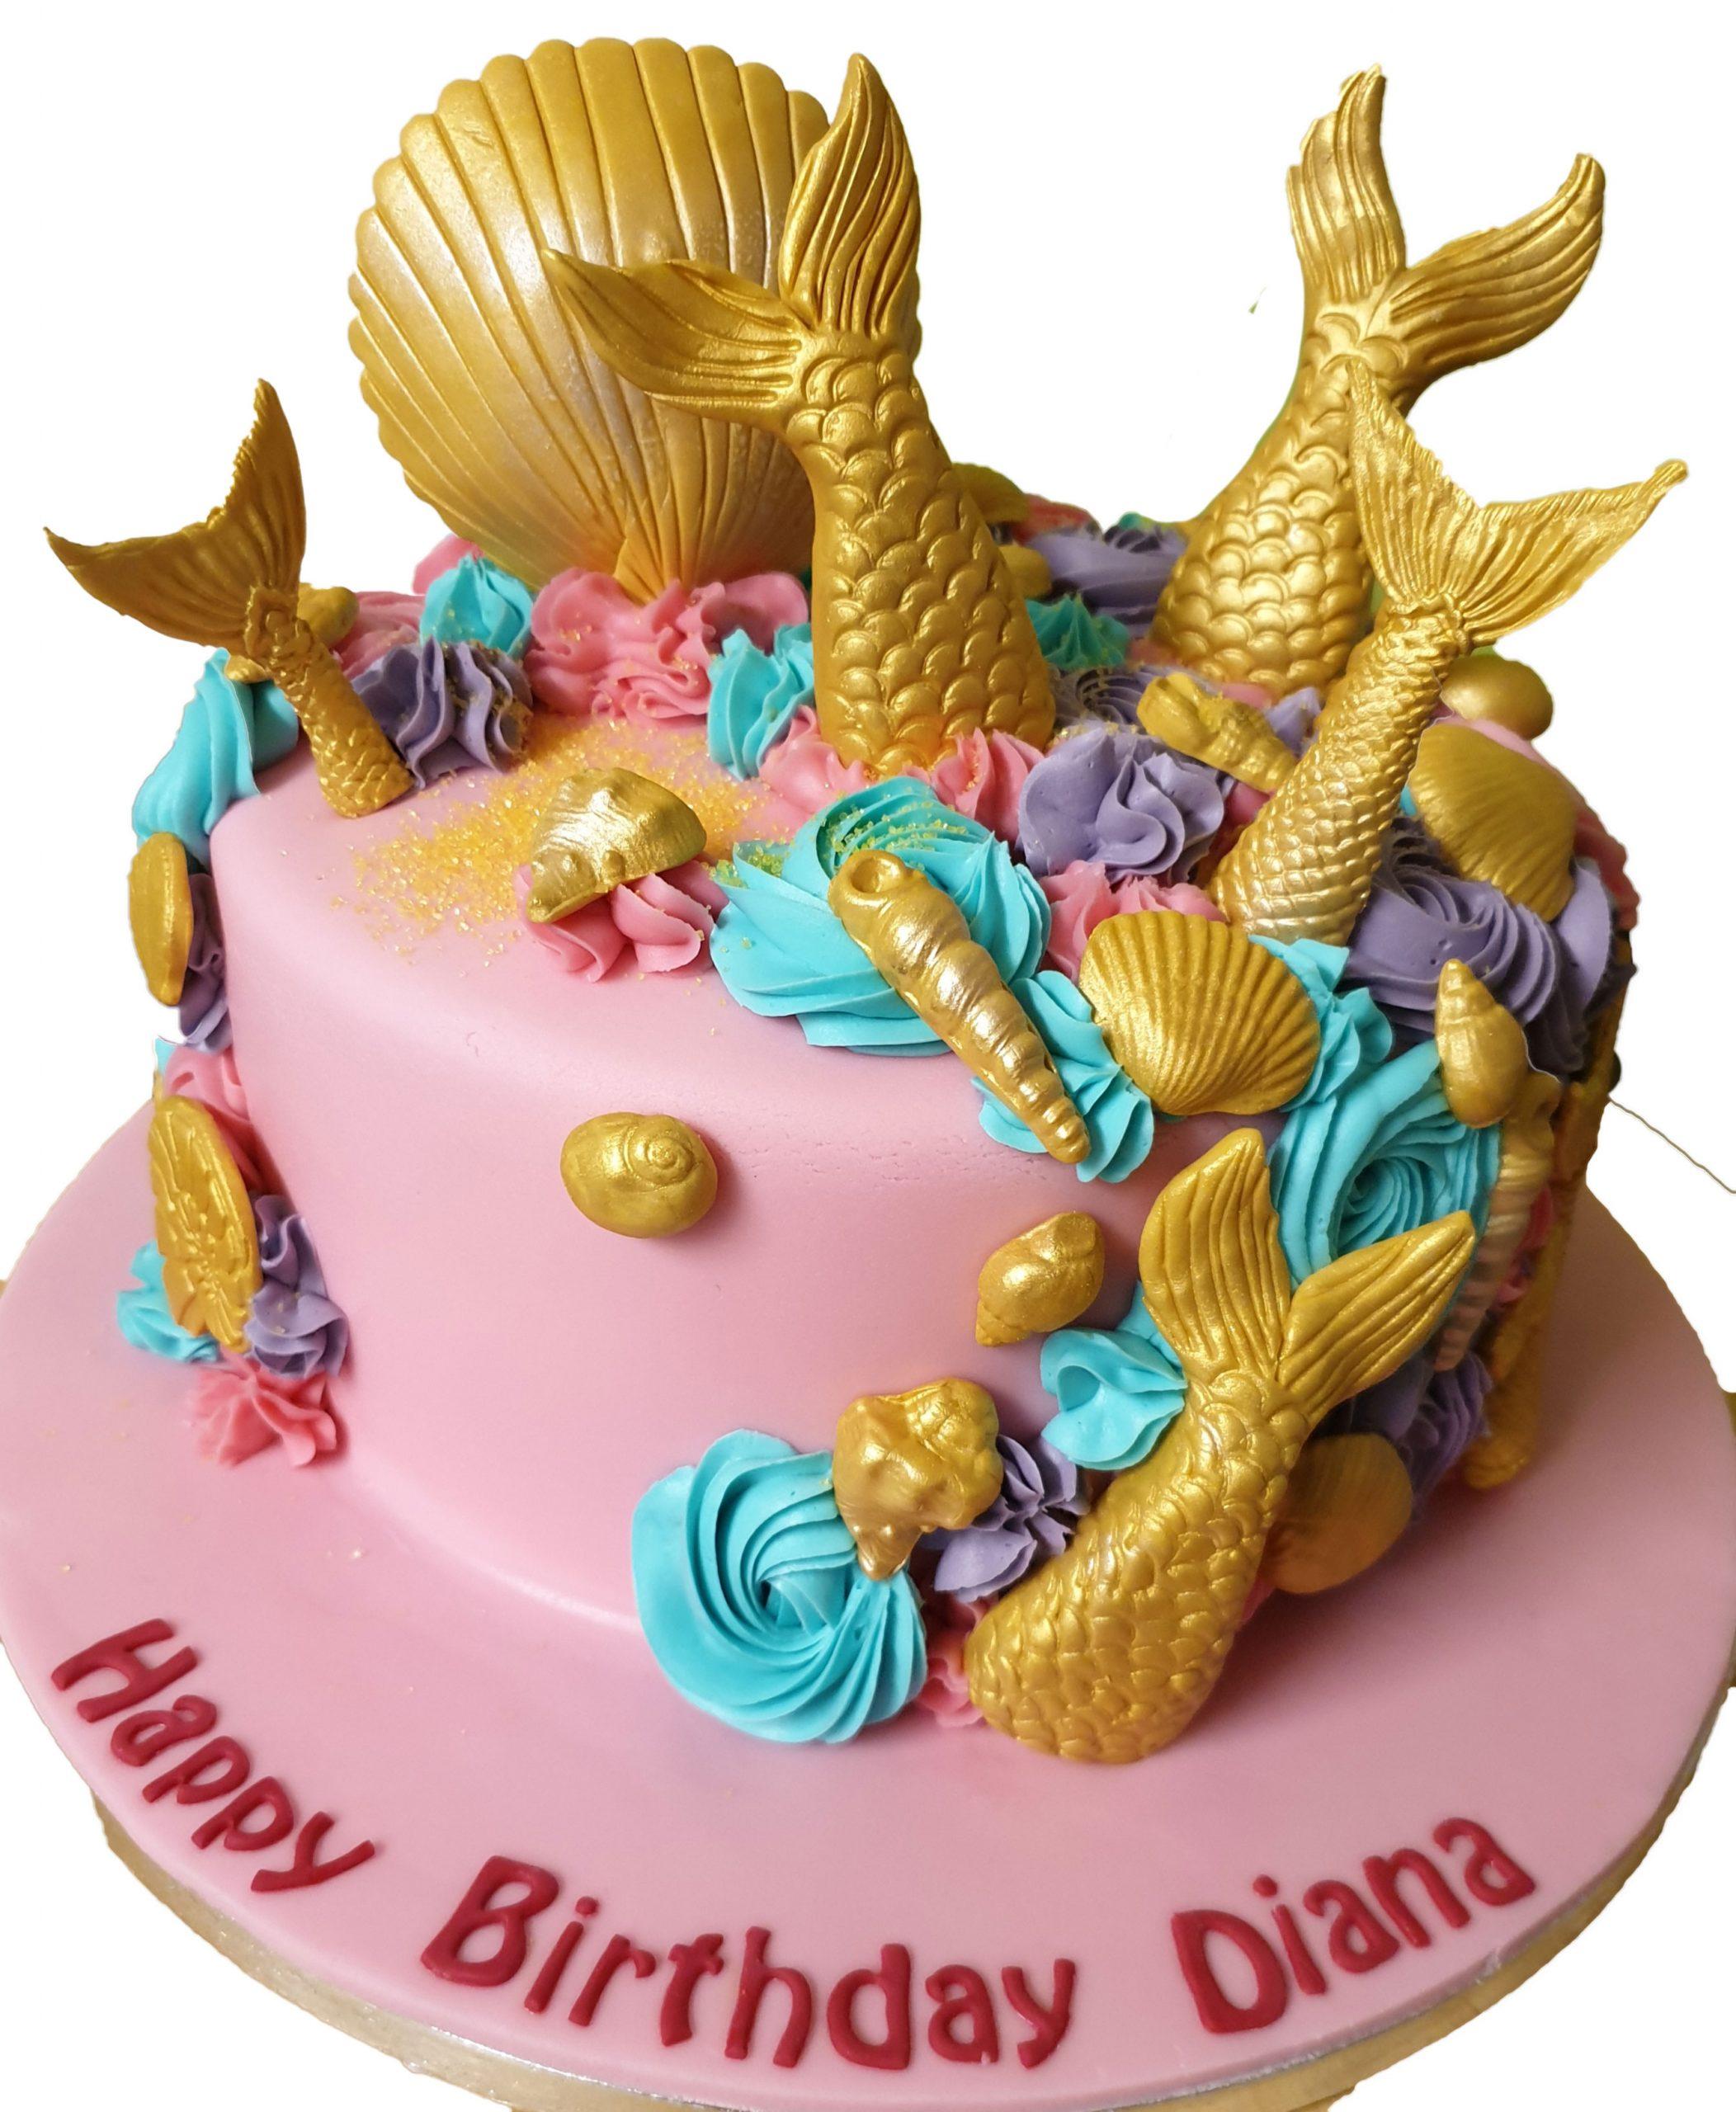 Fabulous Cake Boutique Mermaid Birthday Cake Cb Nc170 Cake Boutique Personalised Birthday Cards Veneteletsinfo